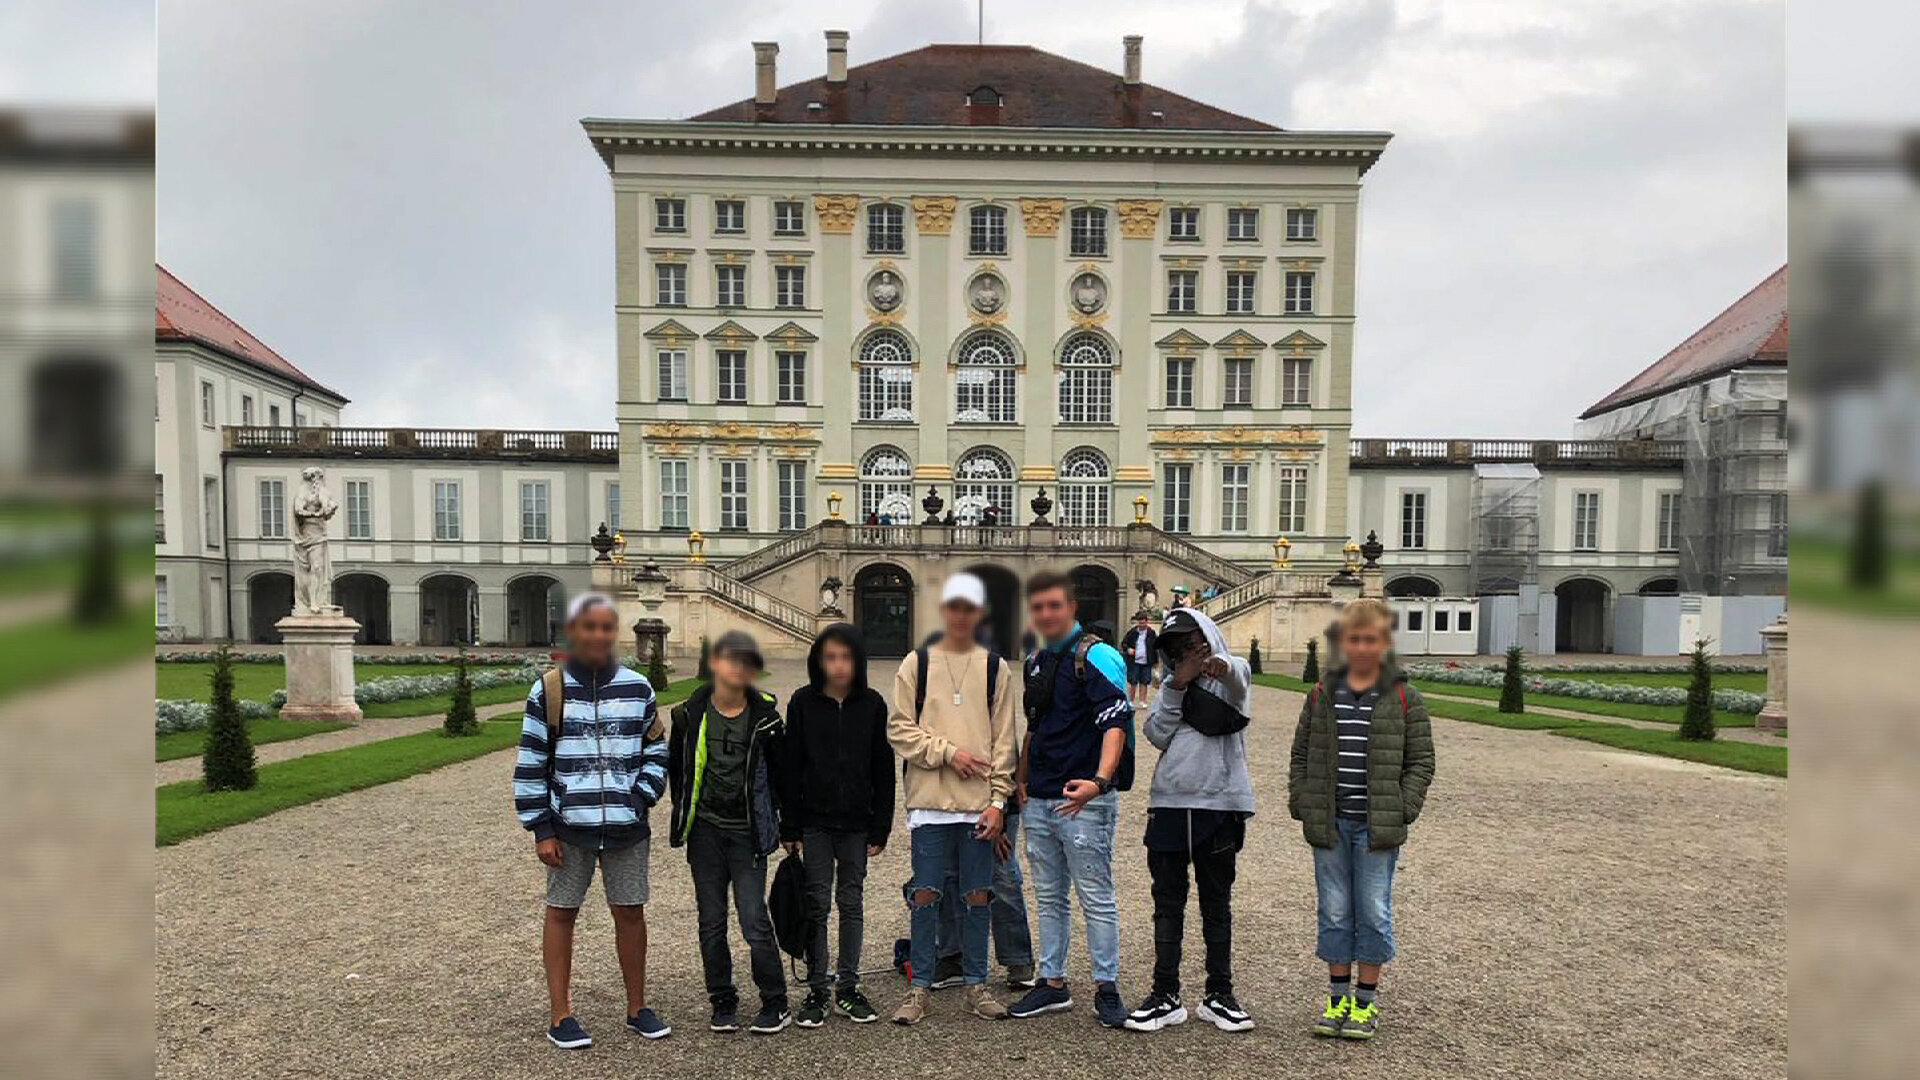 AktuellesPage_Nymphenburg_0919.jpg